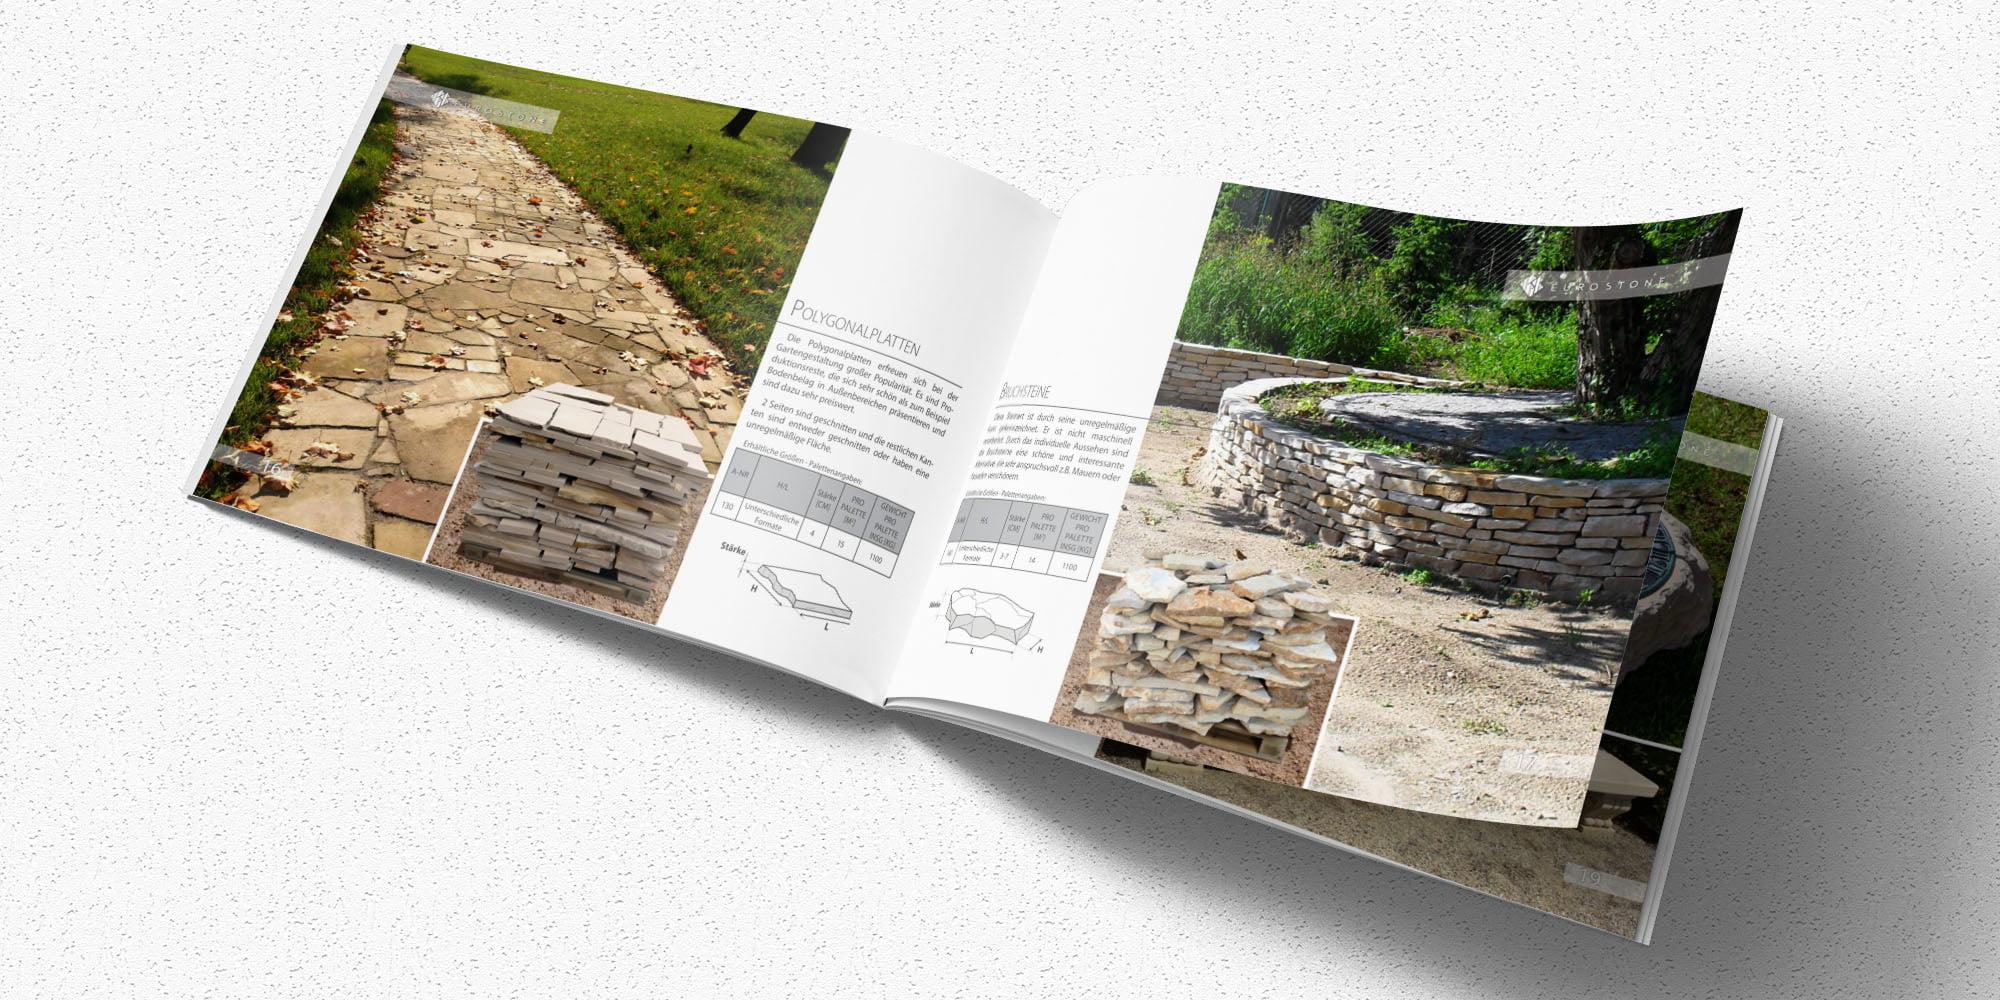 Katalog A5 Eurostone projekt okładki Sto15.pl Autor: Piotr Ratuski